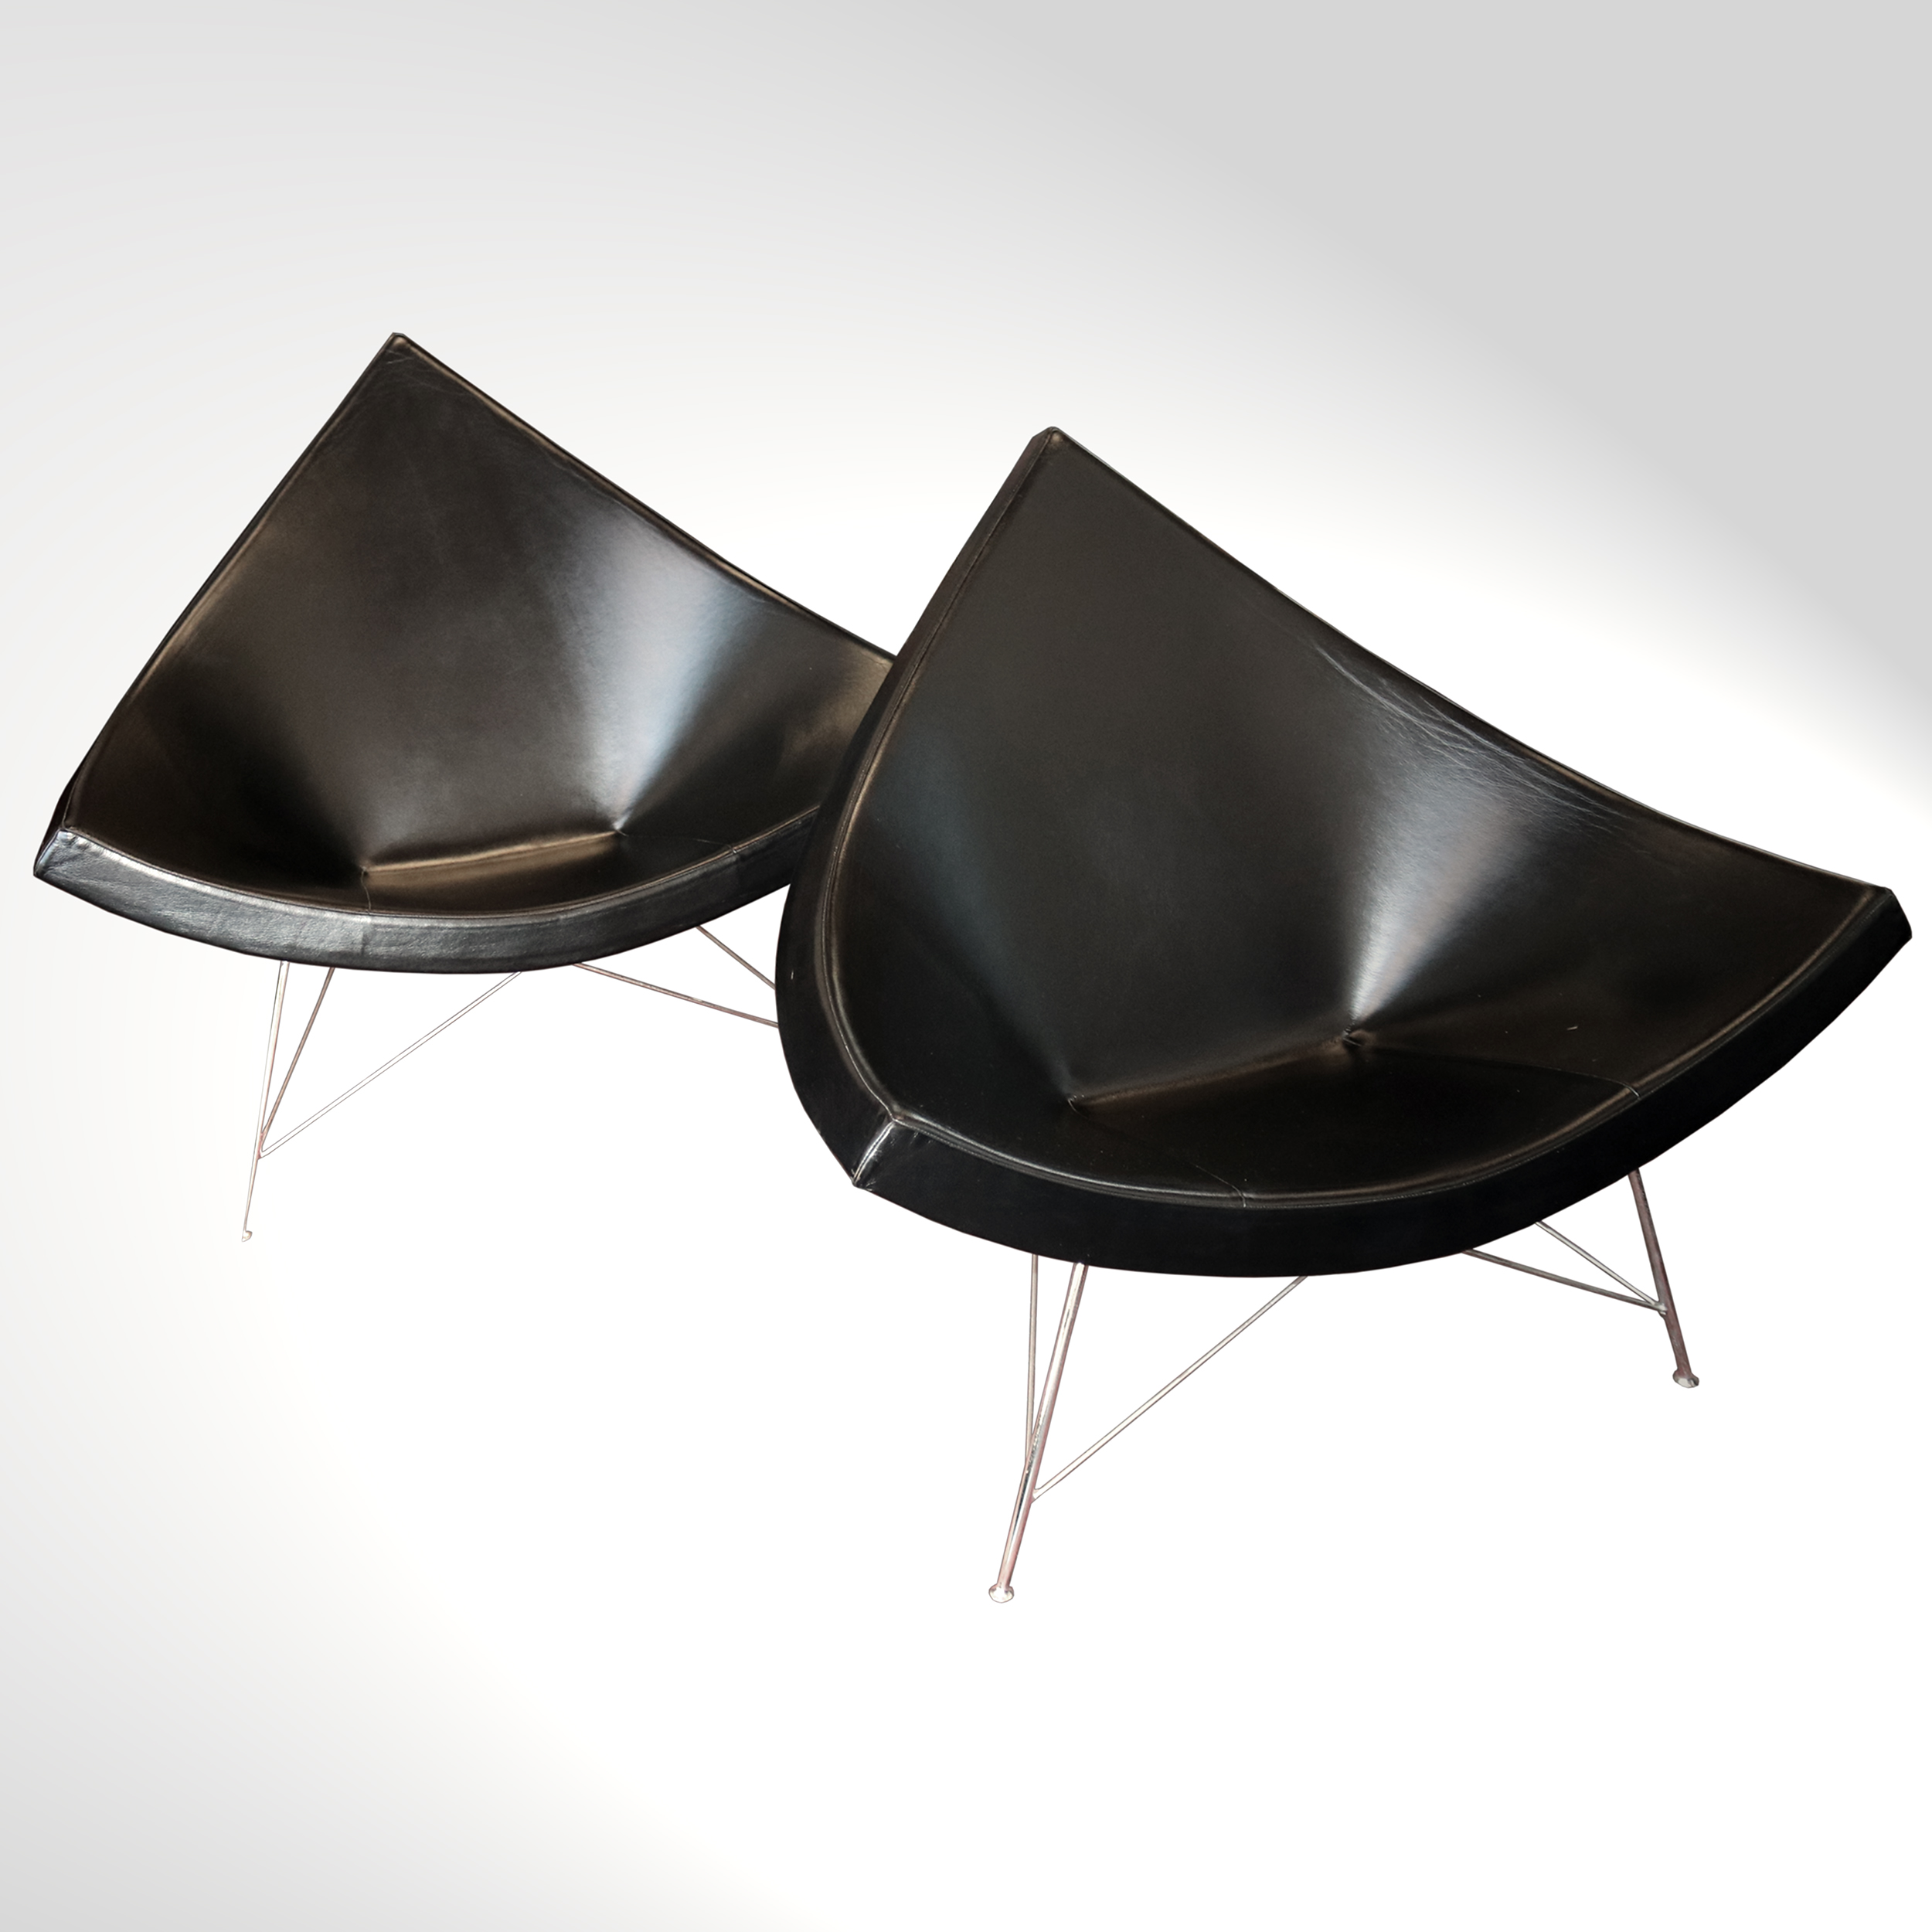 cocconut chairs.jpg